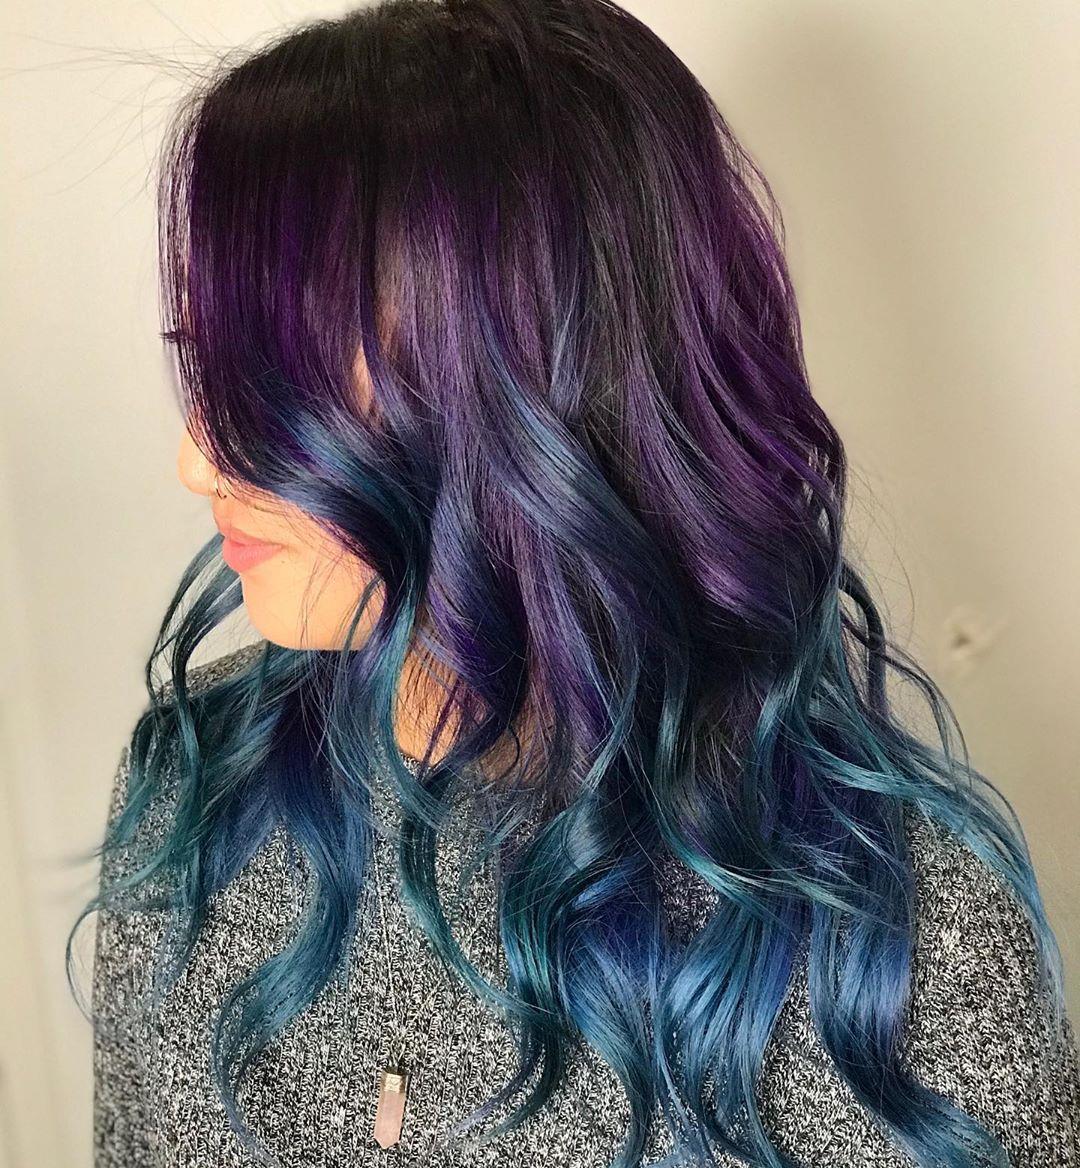 Lunga chioma di capelli mossi viola e blu